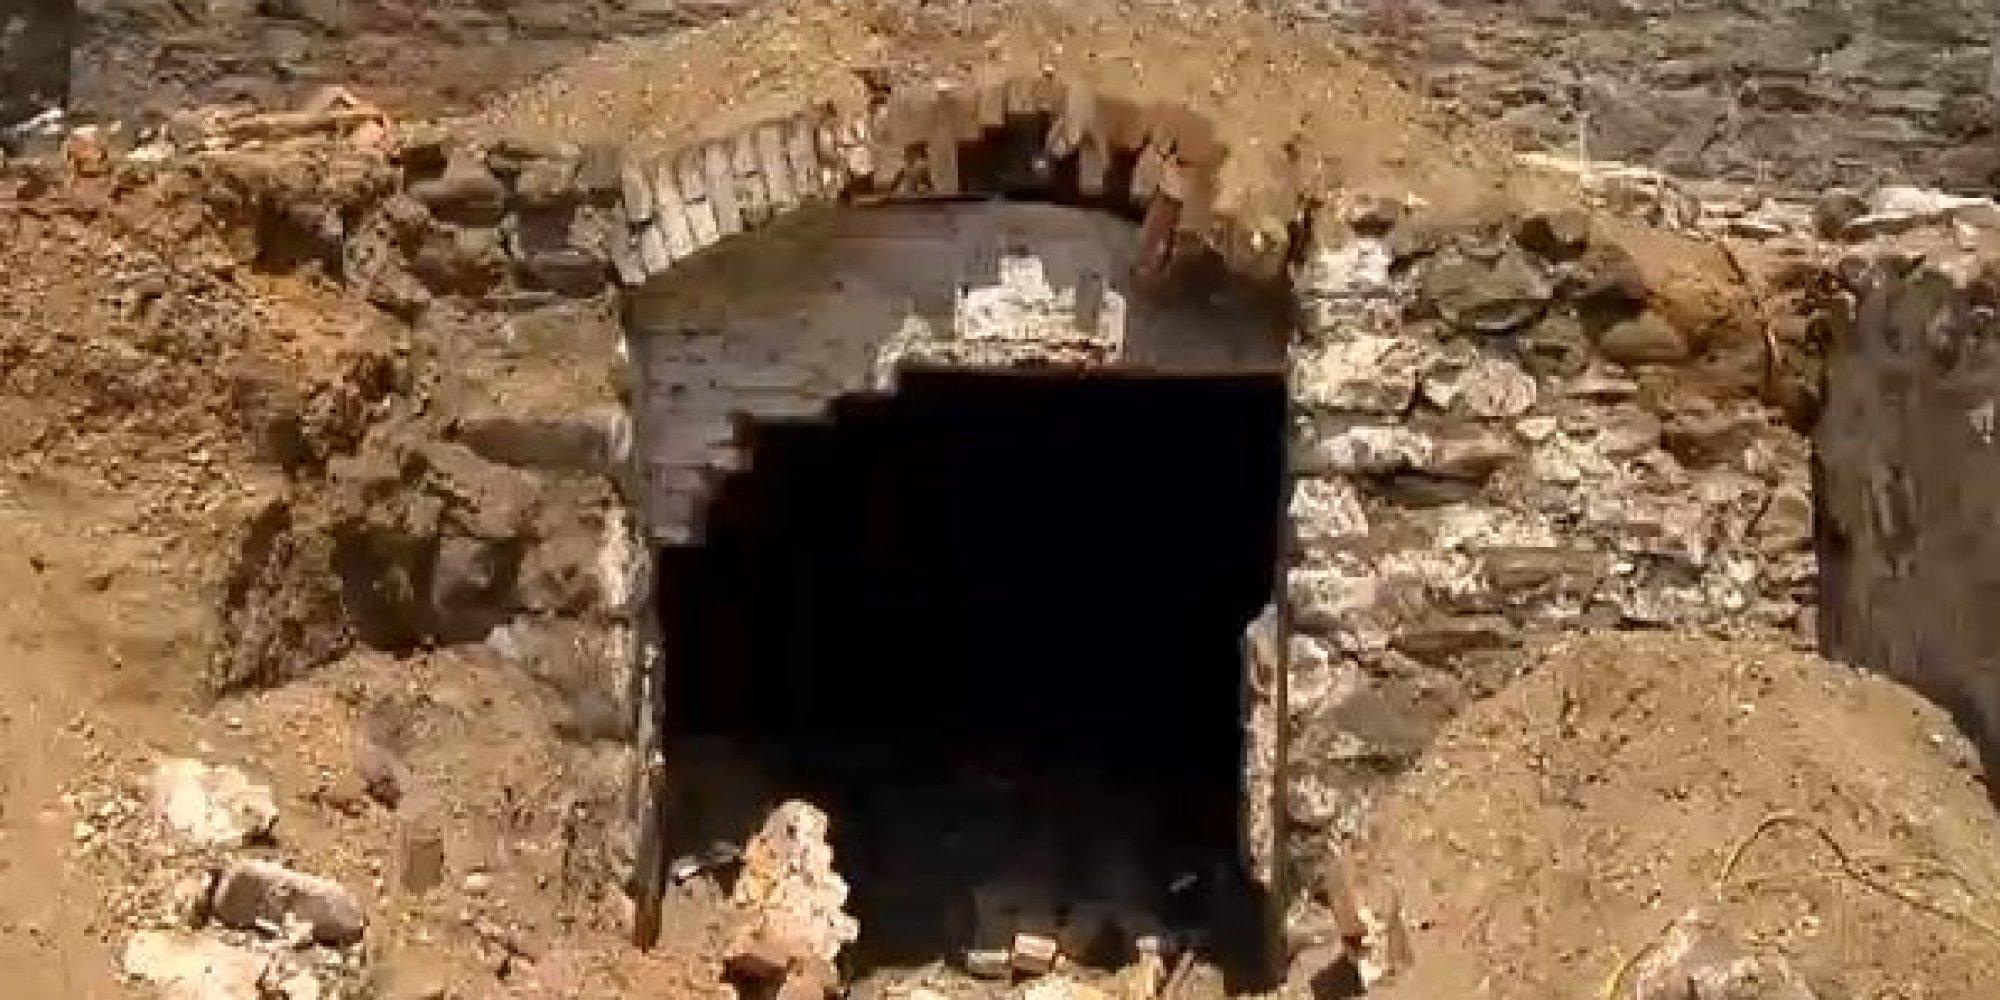 secret room part of underground railroad? | huffpost